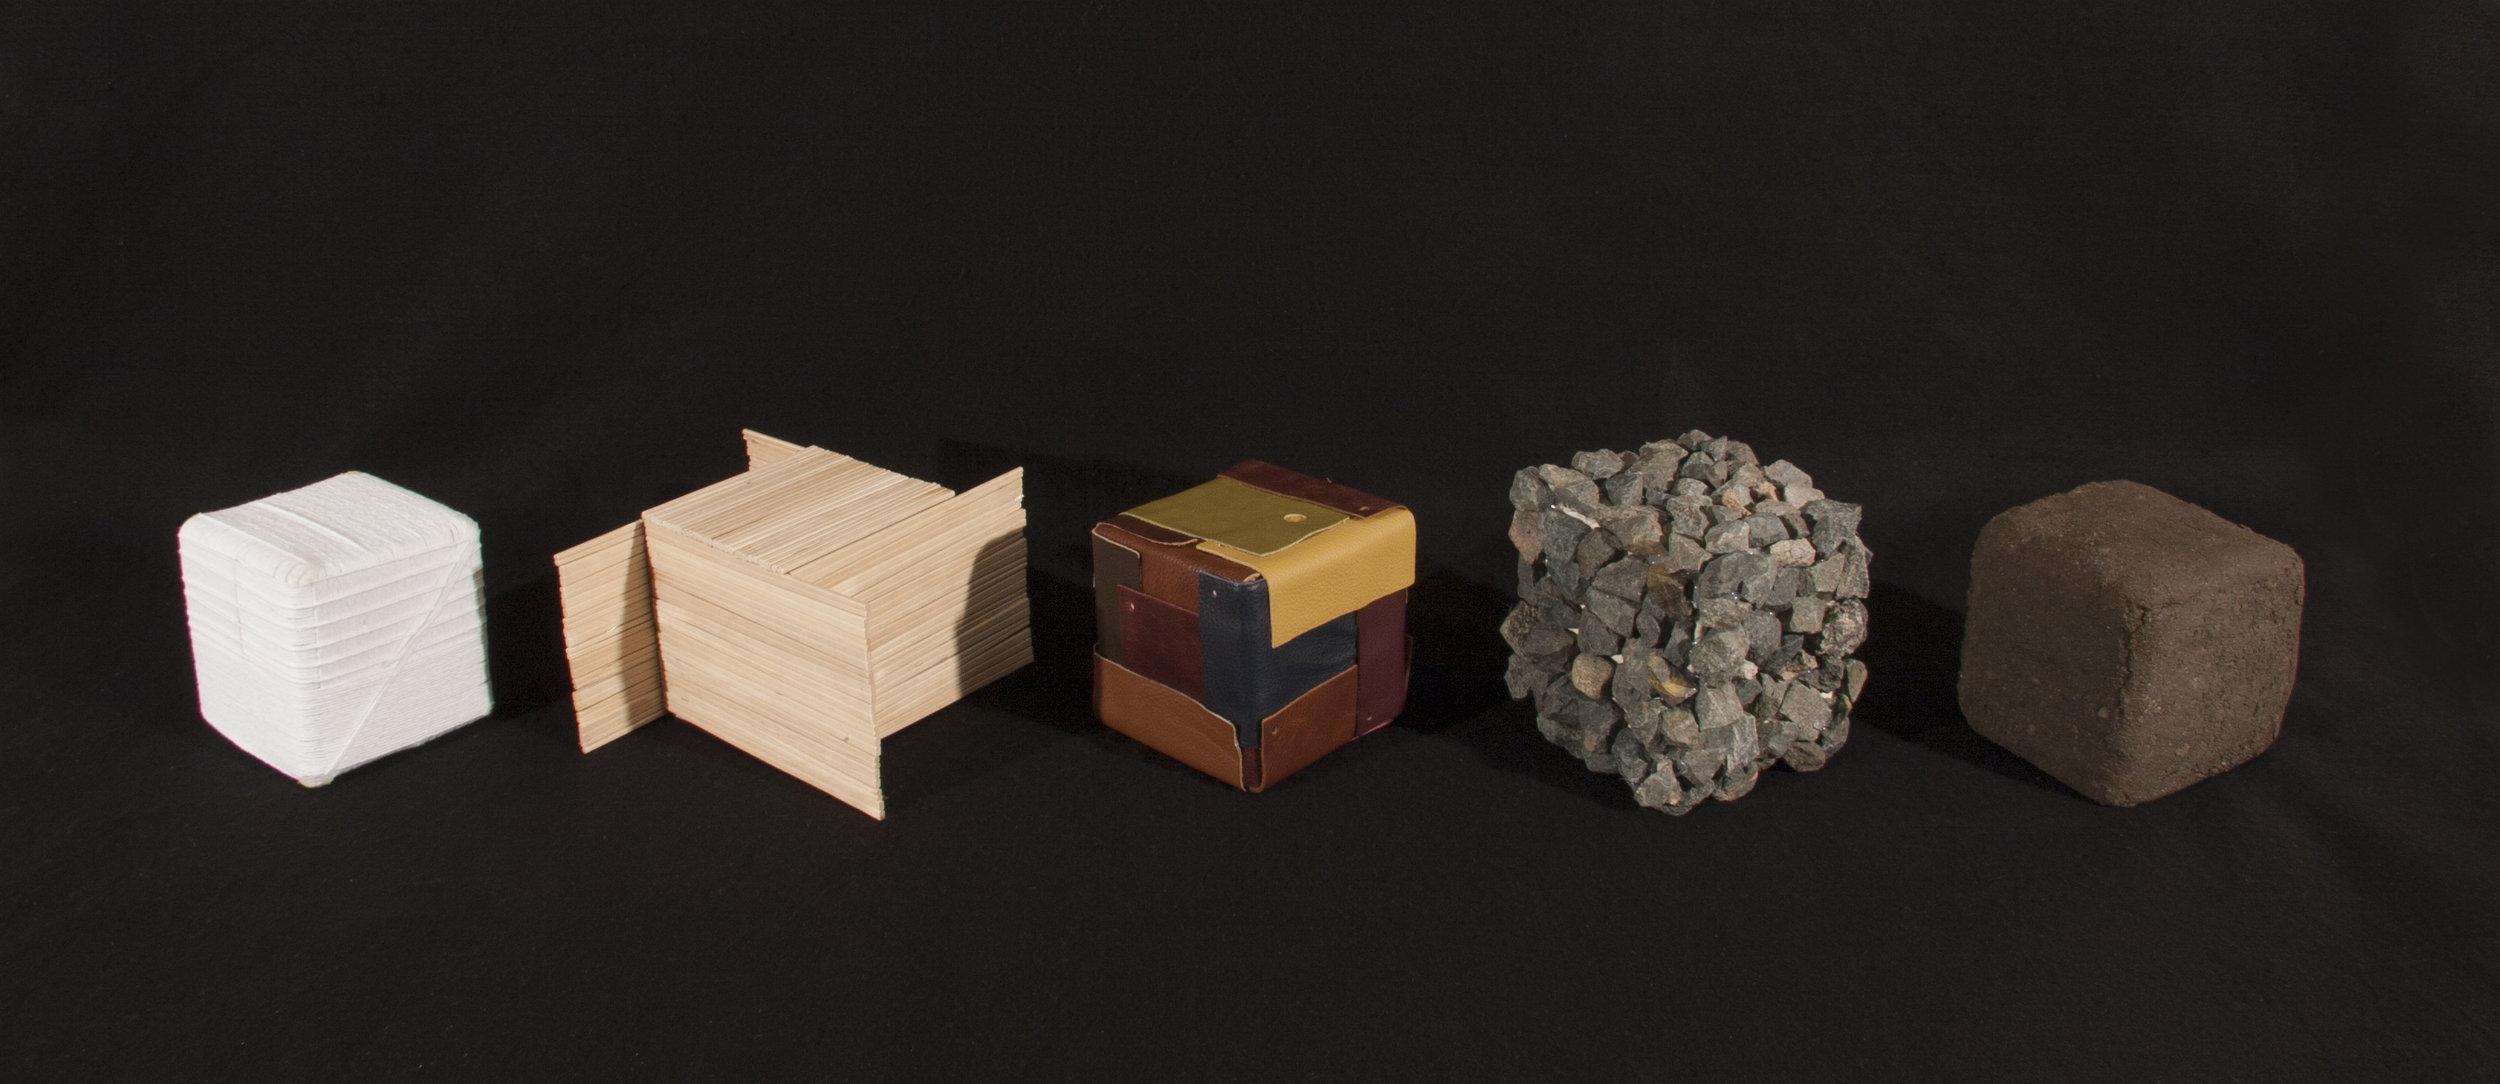 Ilan-box series.jpg